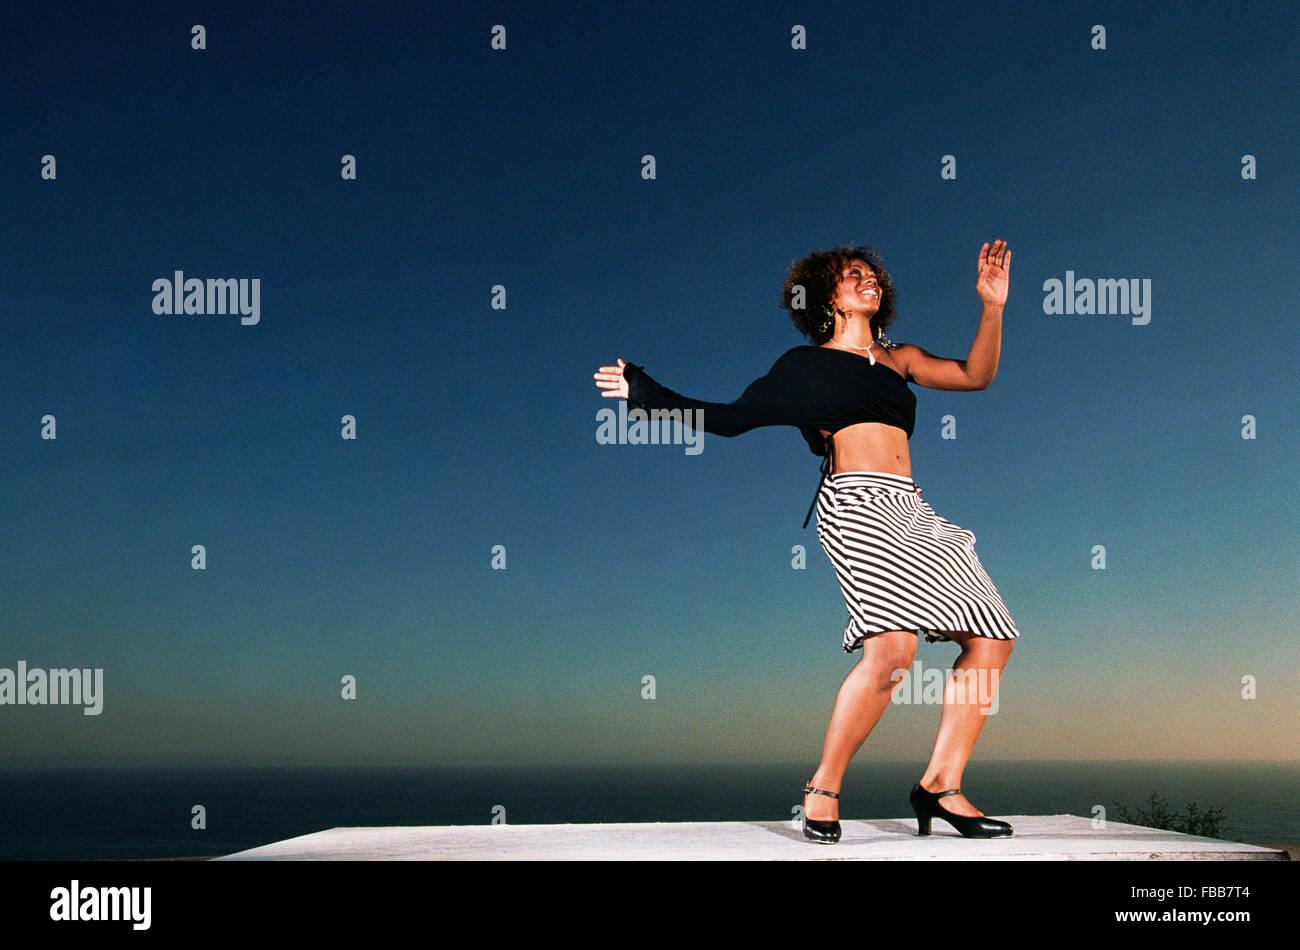 LOS ANGELES, CA – AUGUST 28: Alexandria Bradley tap dancing in Los Angeles, California on August 28, 2003. - Stock Image